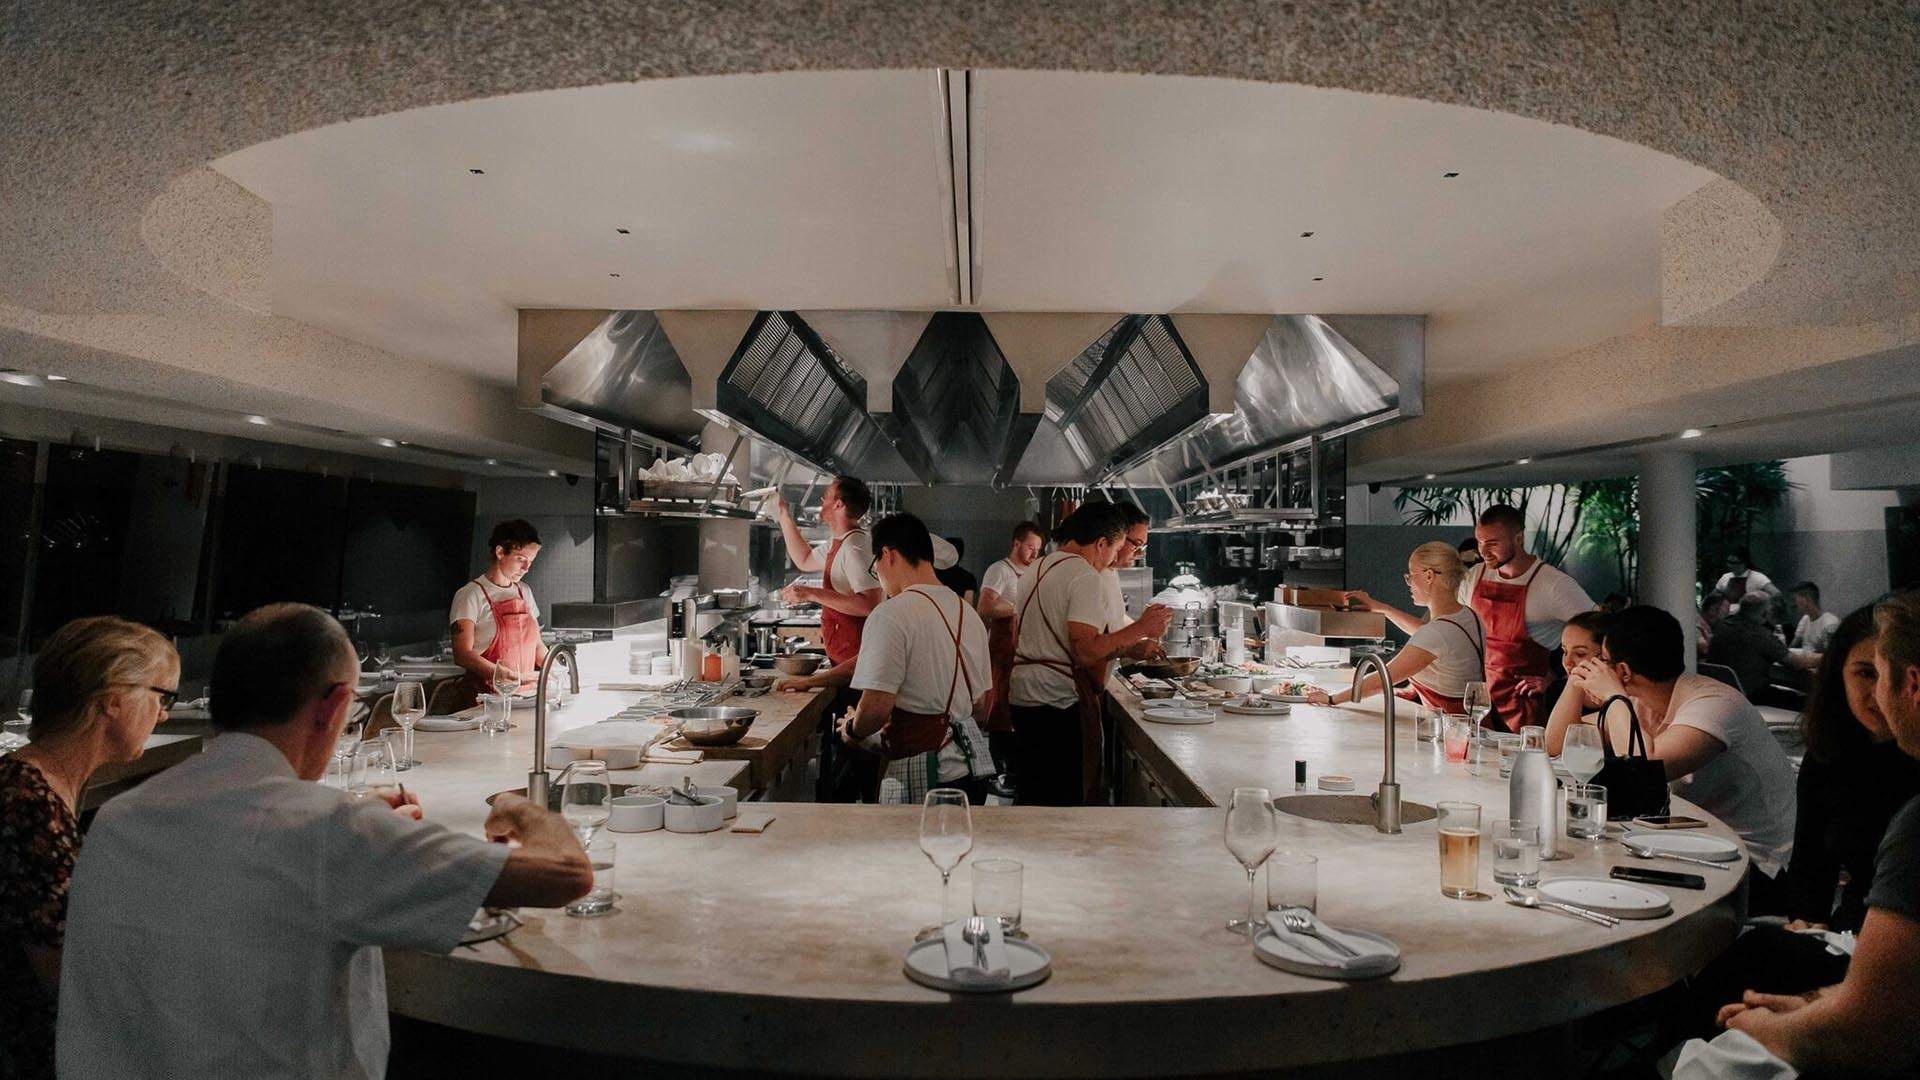 Brisbane's Most Popular Restaurants of 2021 So Far